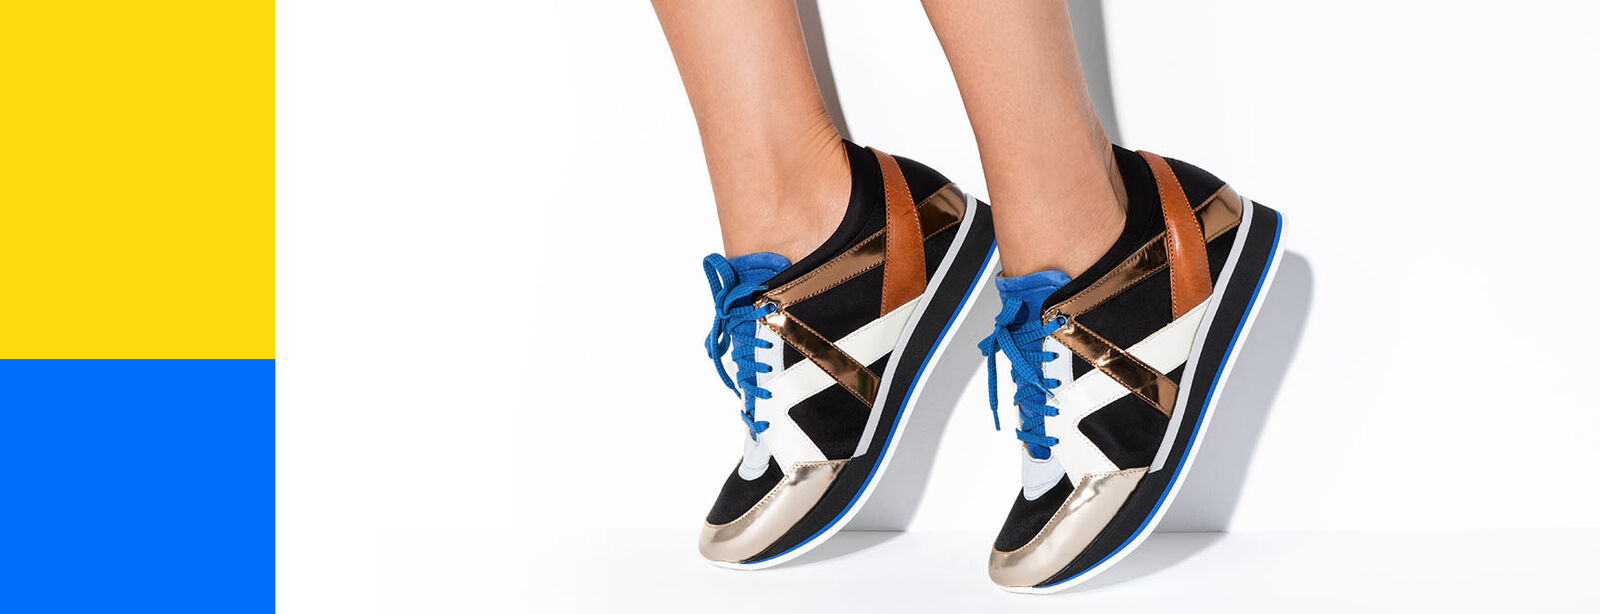 Tendances chaussures